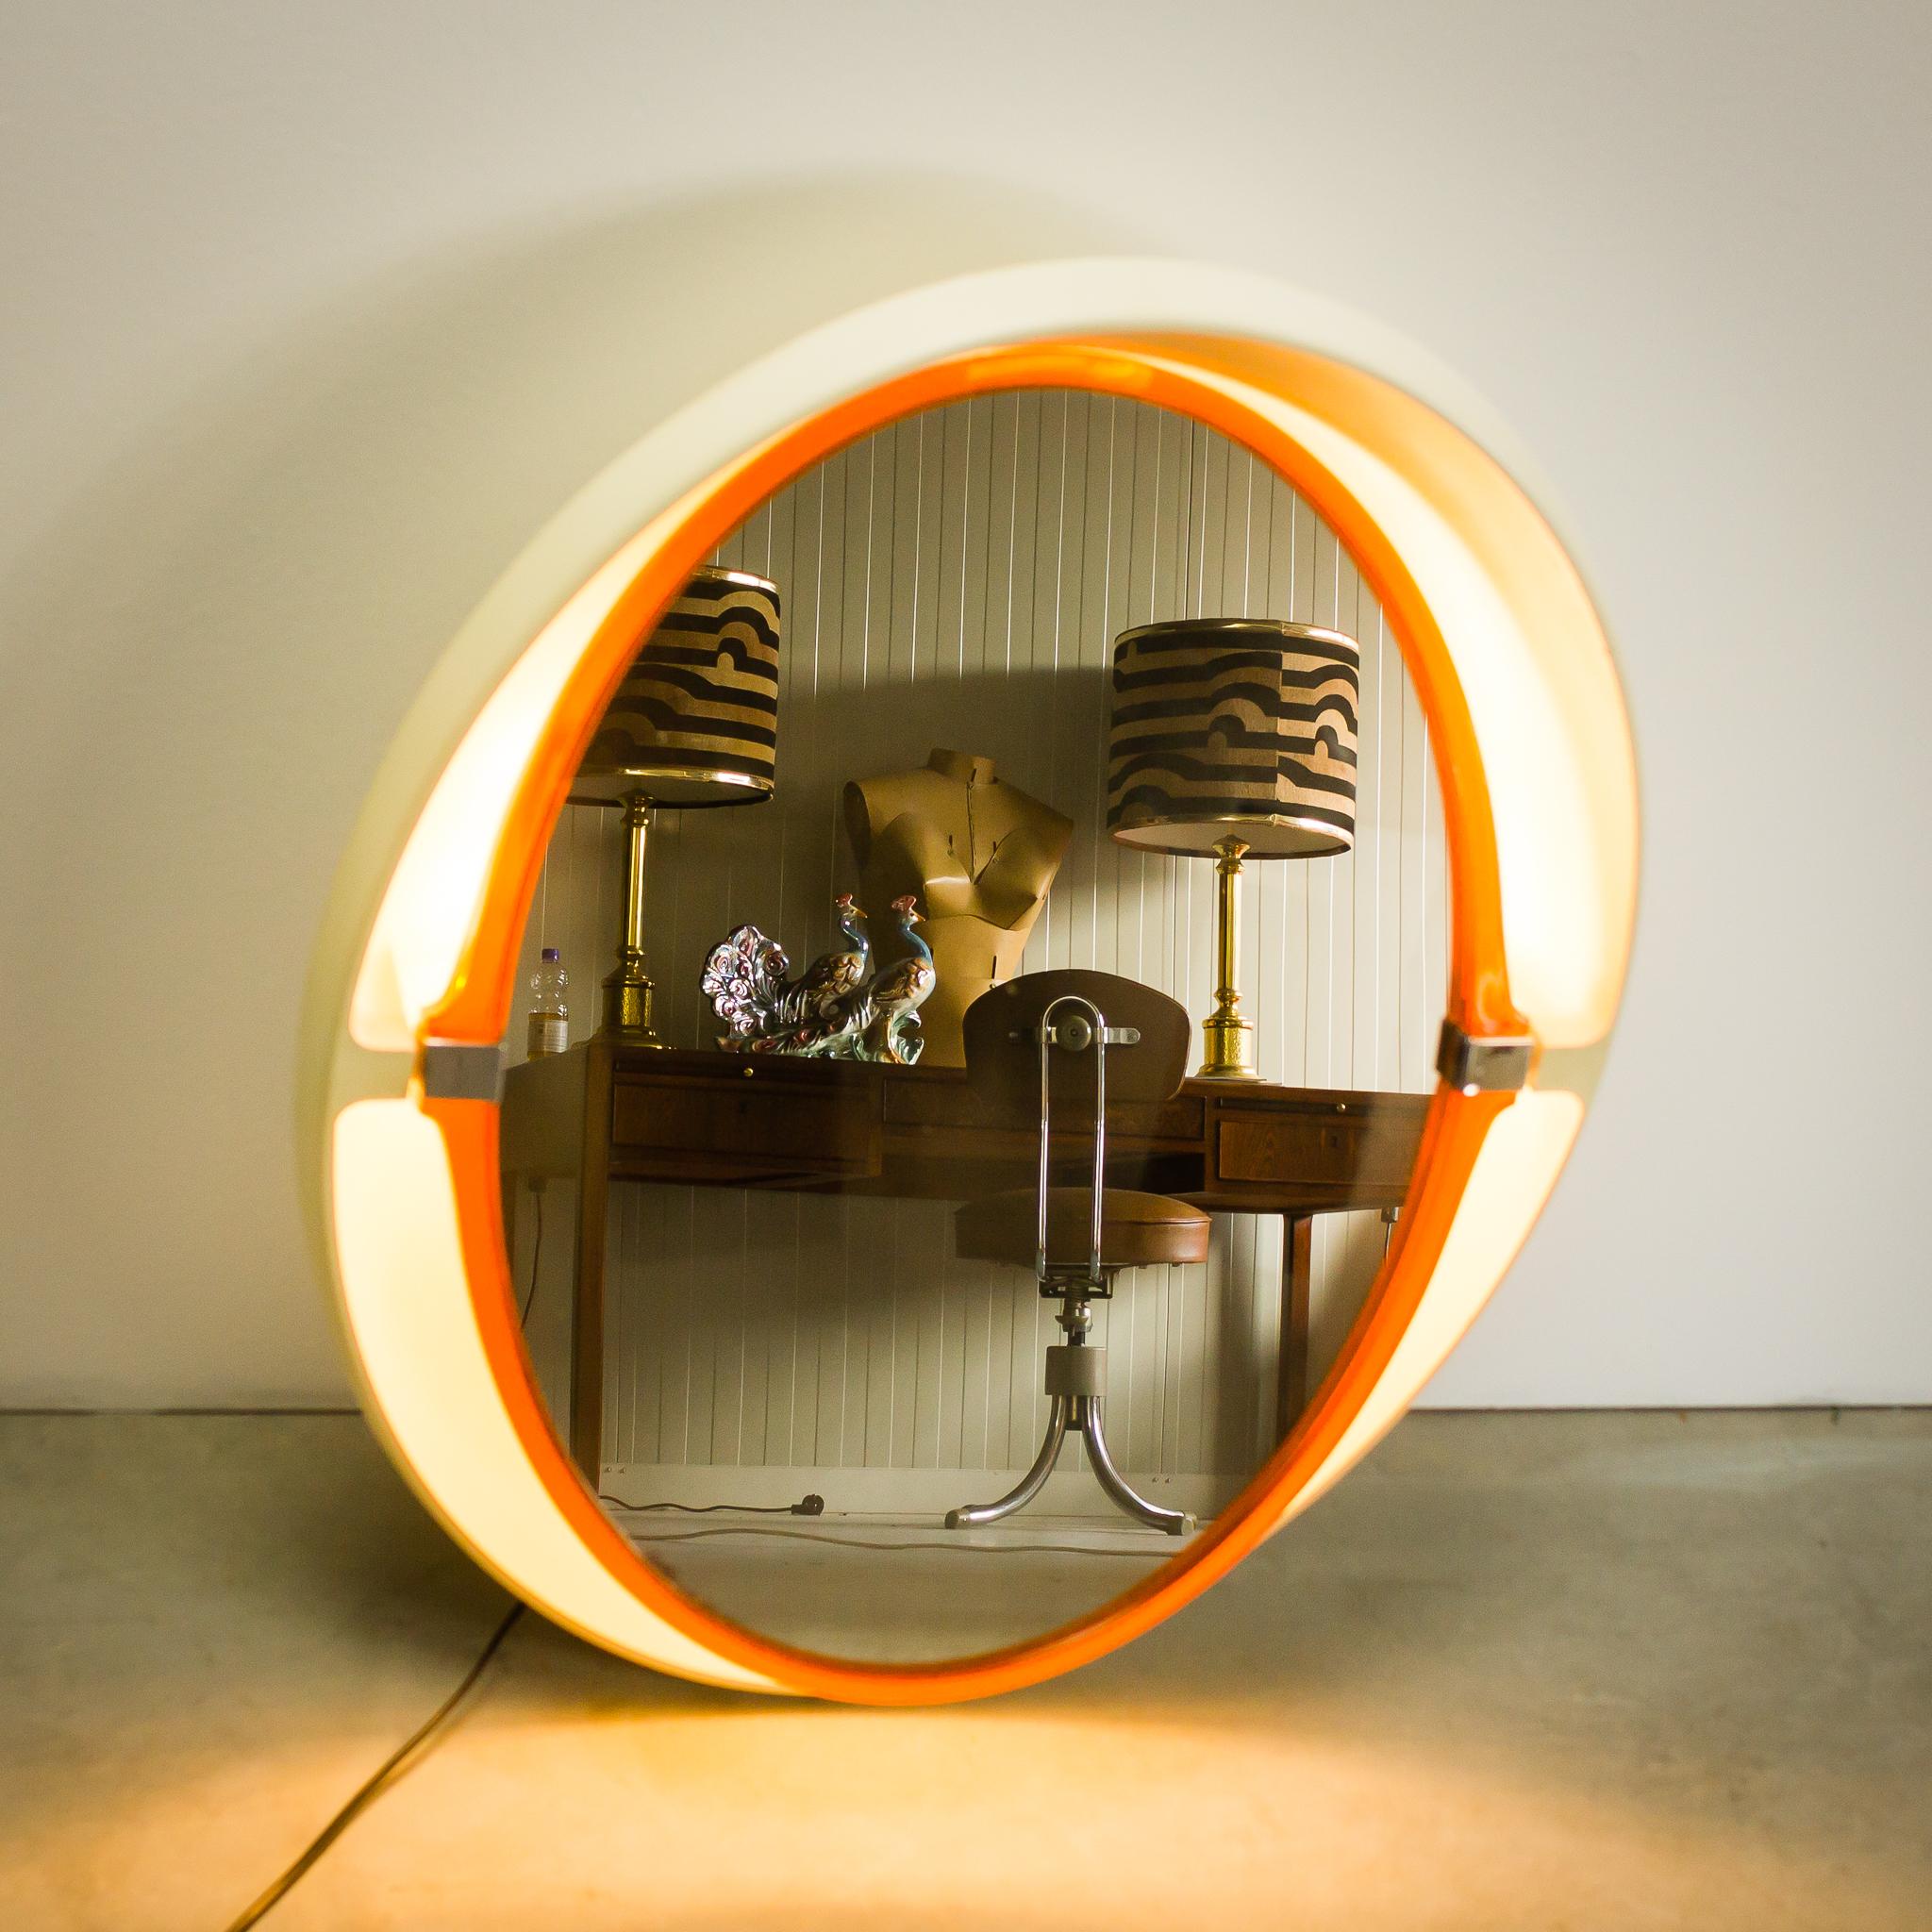 Space-Age Allibert A136 wand spiegel met licht | BarbMama